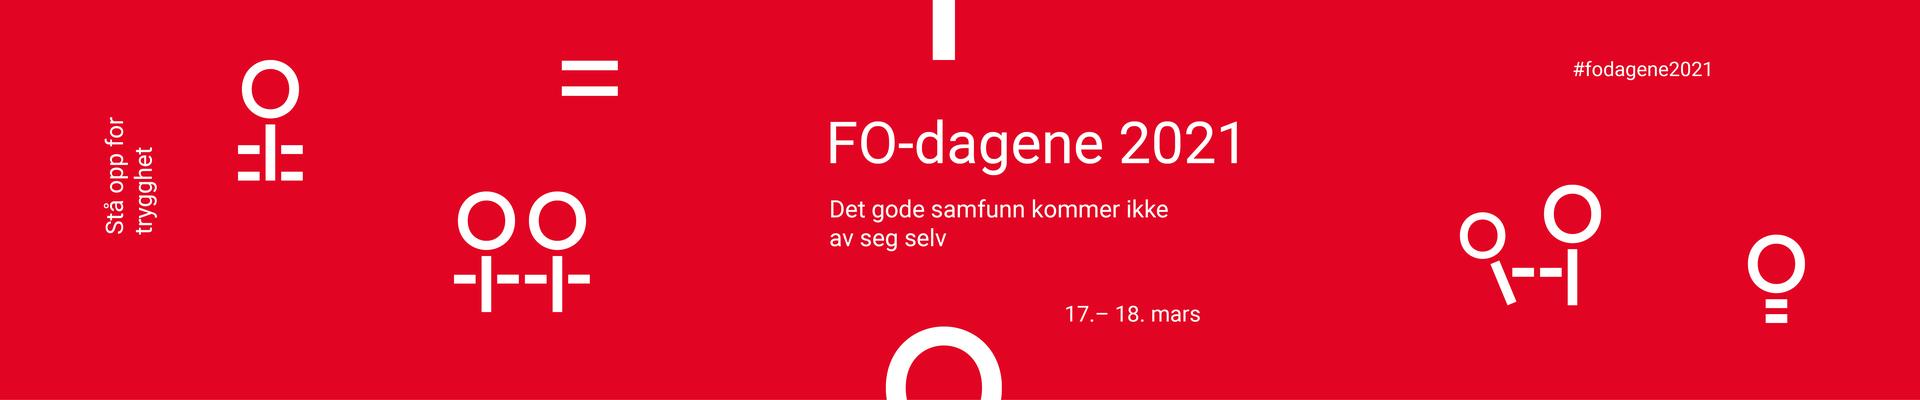 FO-dagene 2021